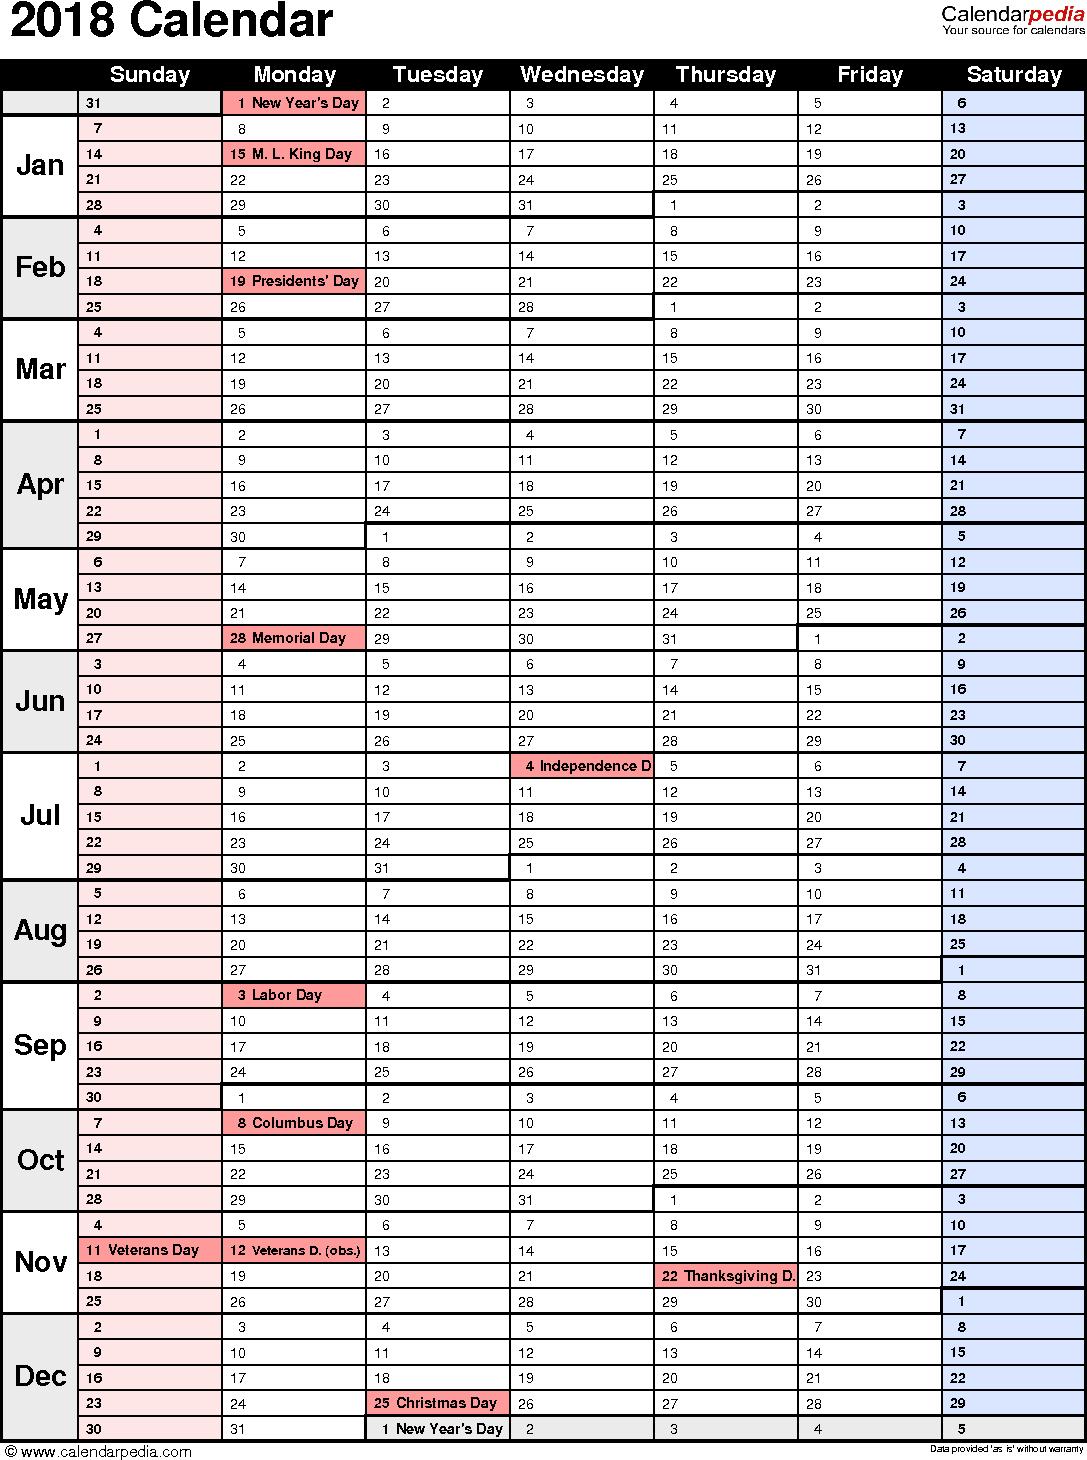 Samples Of Excel Calendar 2018 Template Intended For Excel Calendar 2018 Template Download